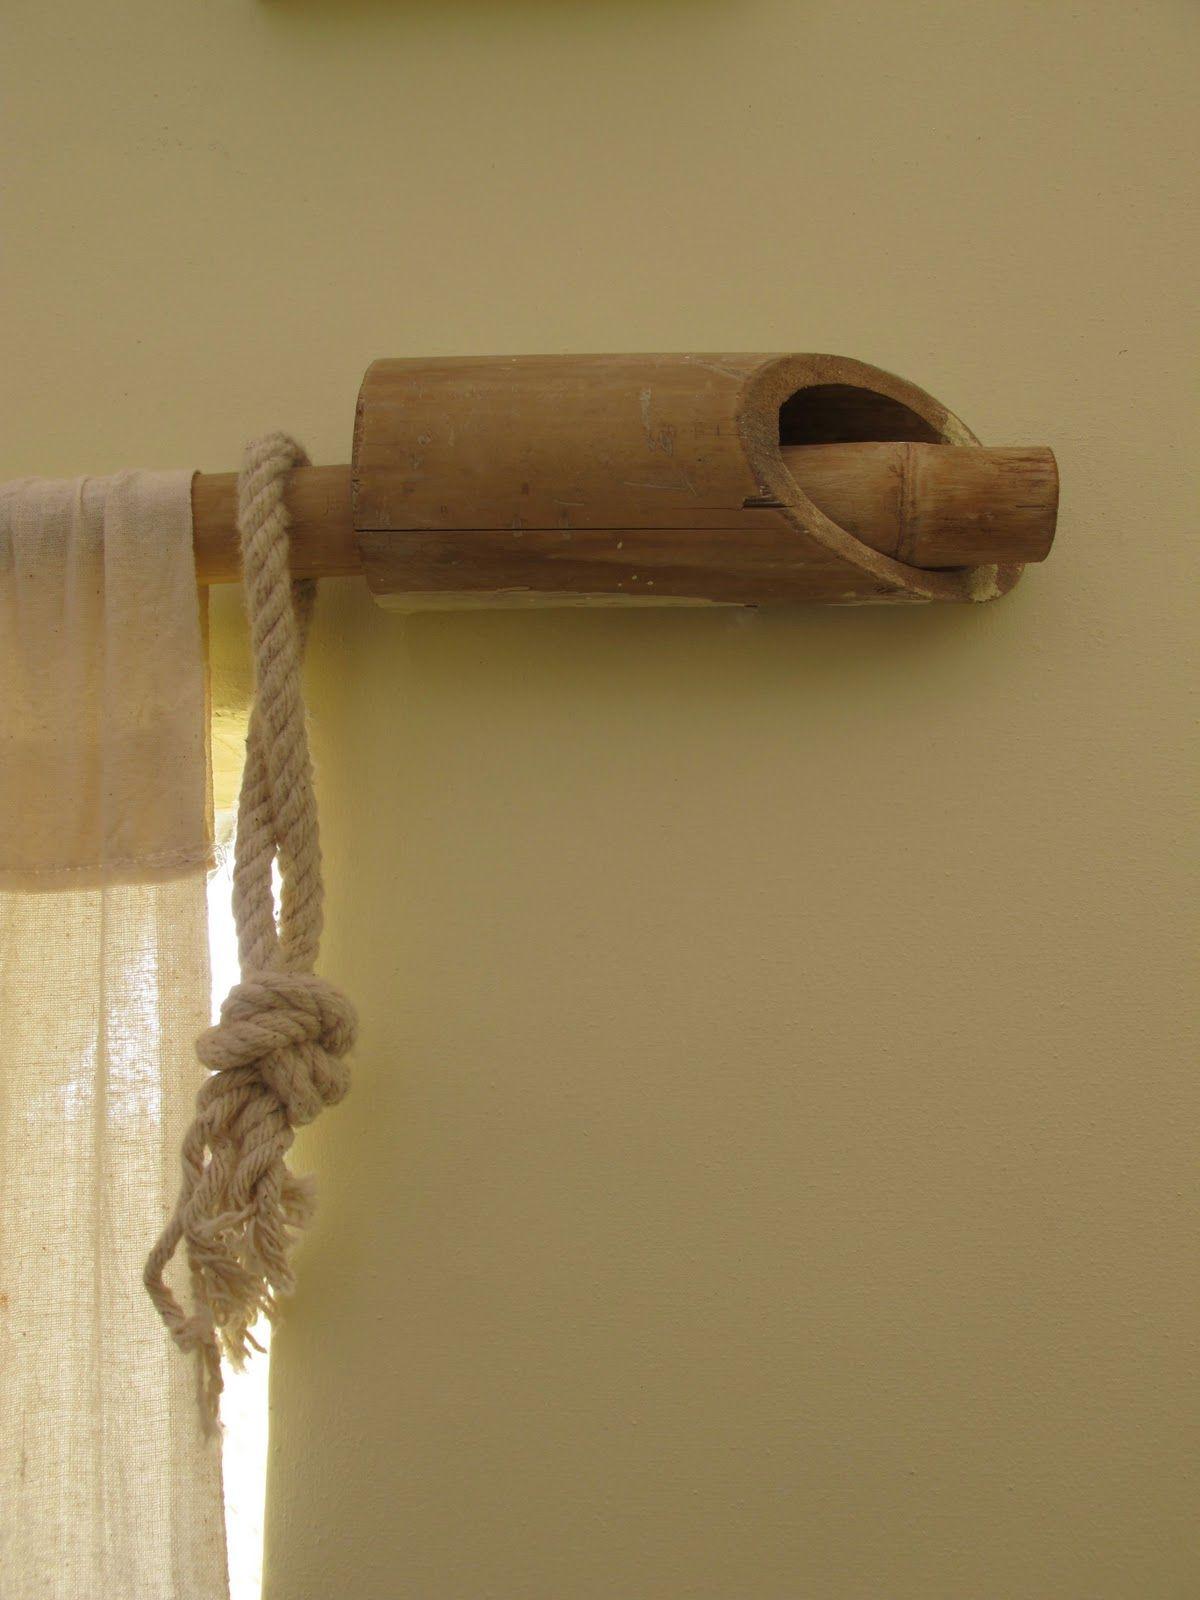 Bamboo curtain rod pinteres bamboo curtain rod ms curtain hangerspipe curtain rodscool curtainsbamboo curtainshomemade curtainssliding glass doorglass eventelaan Gallery